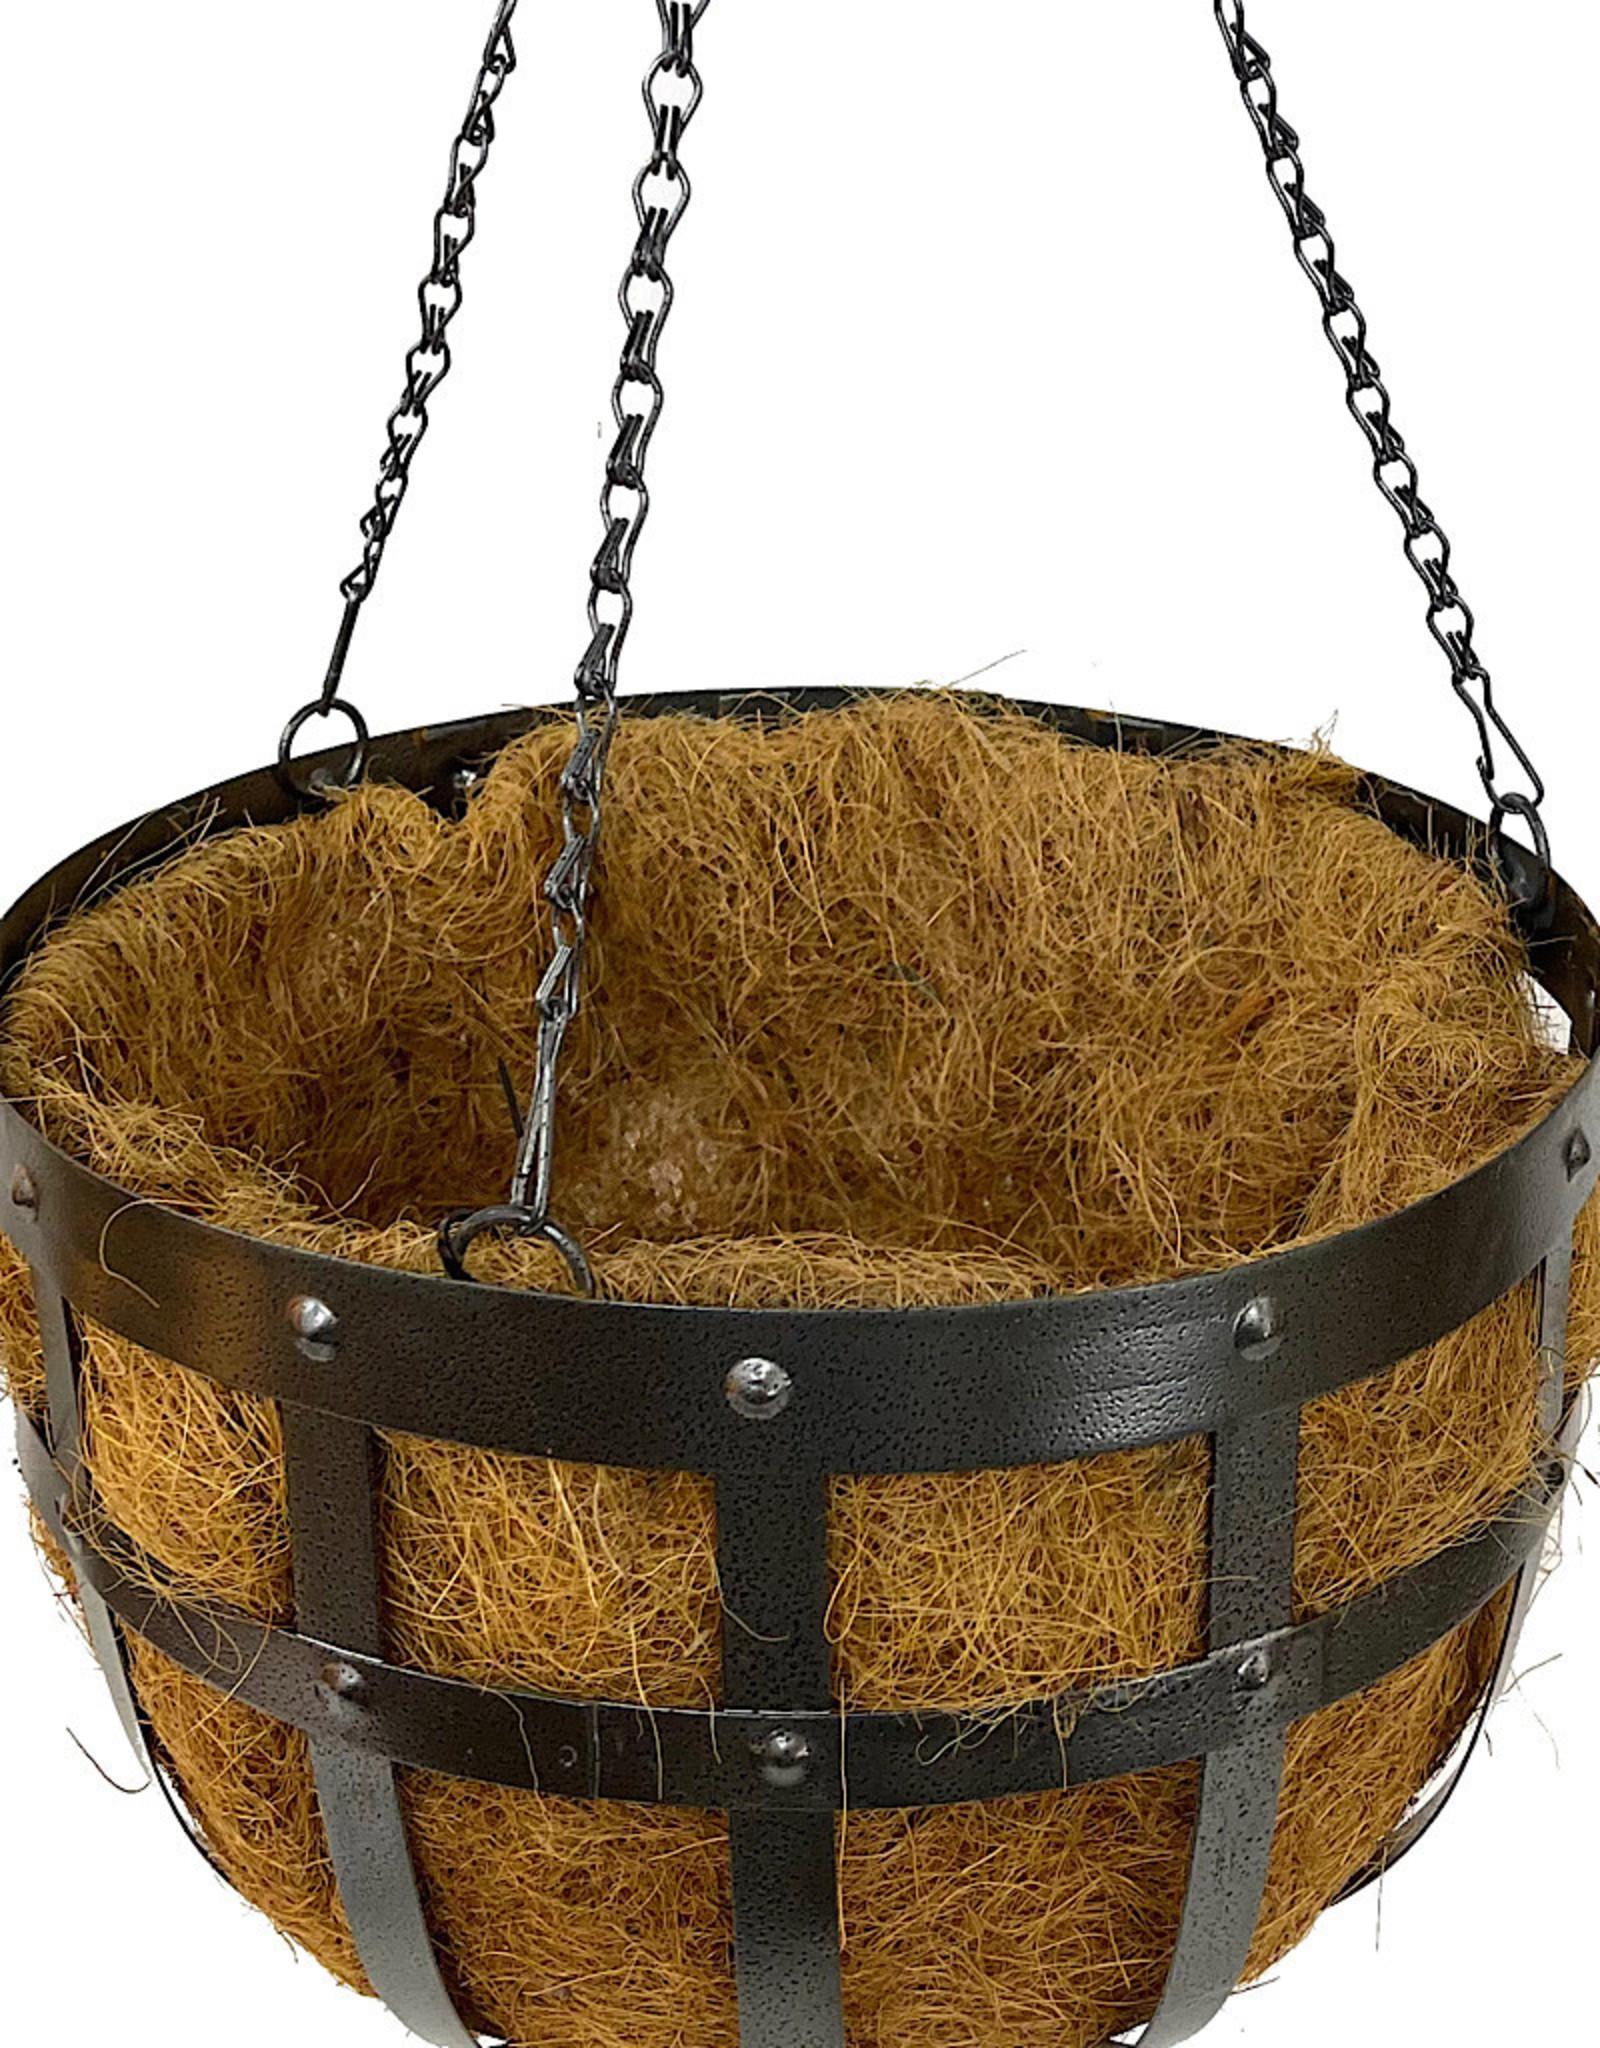 Industrial Hanging Basket 14 Inch